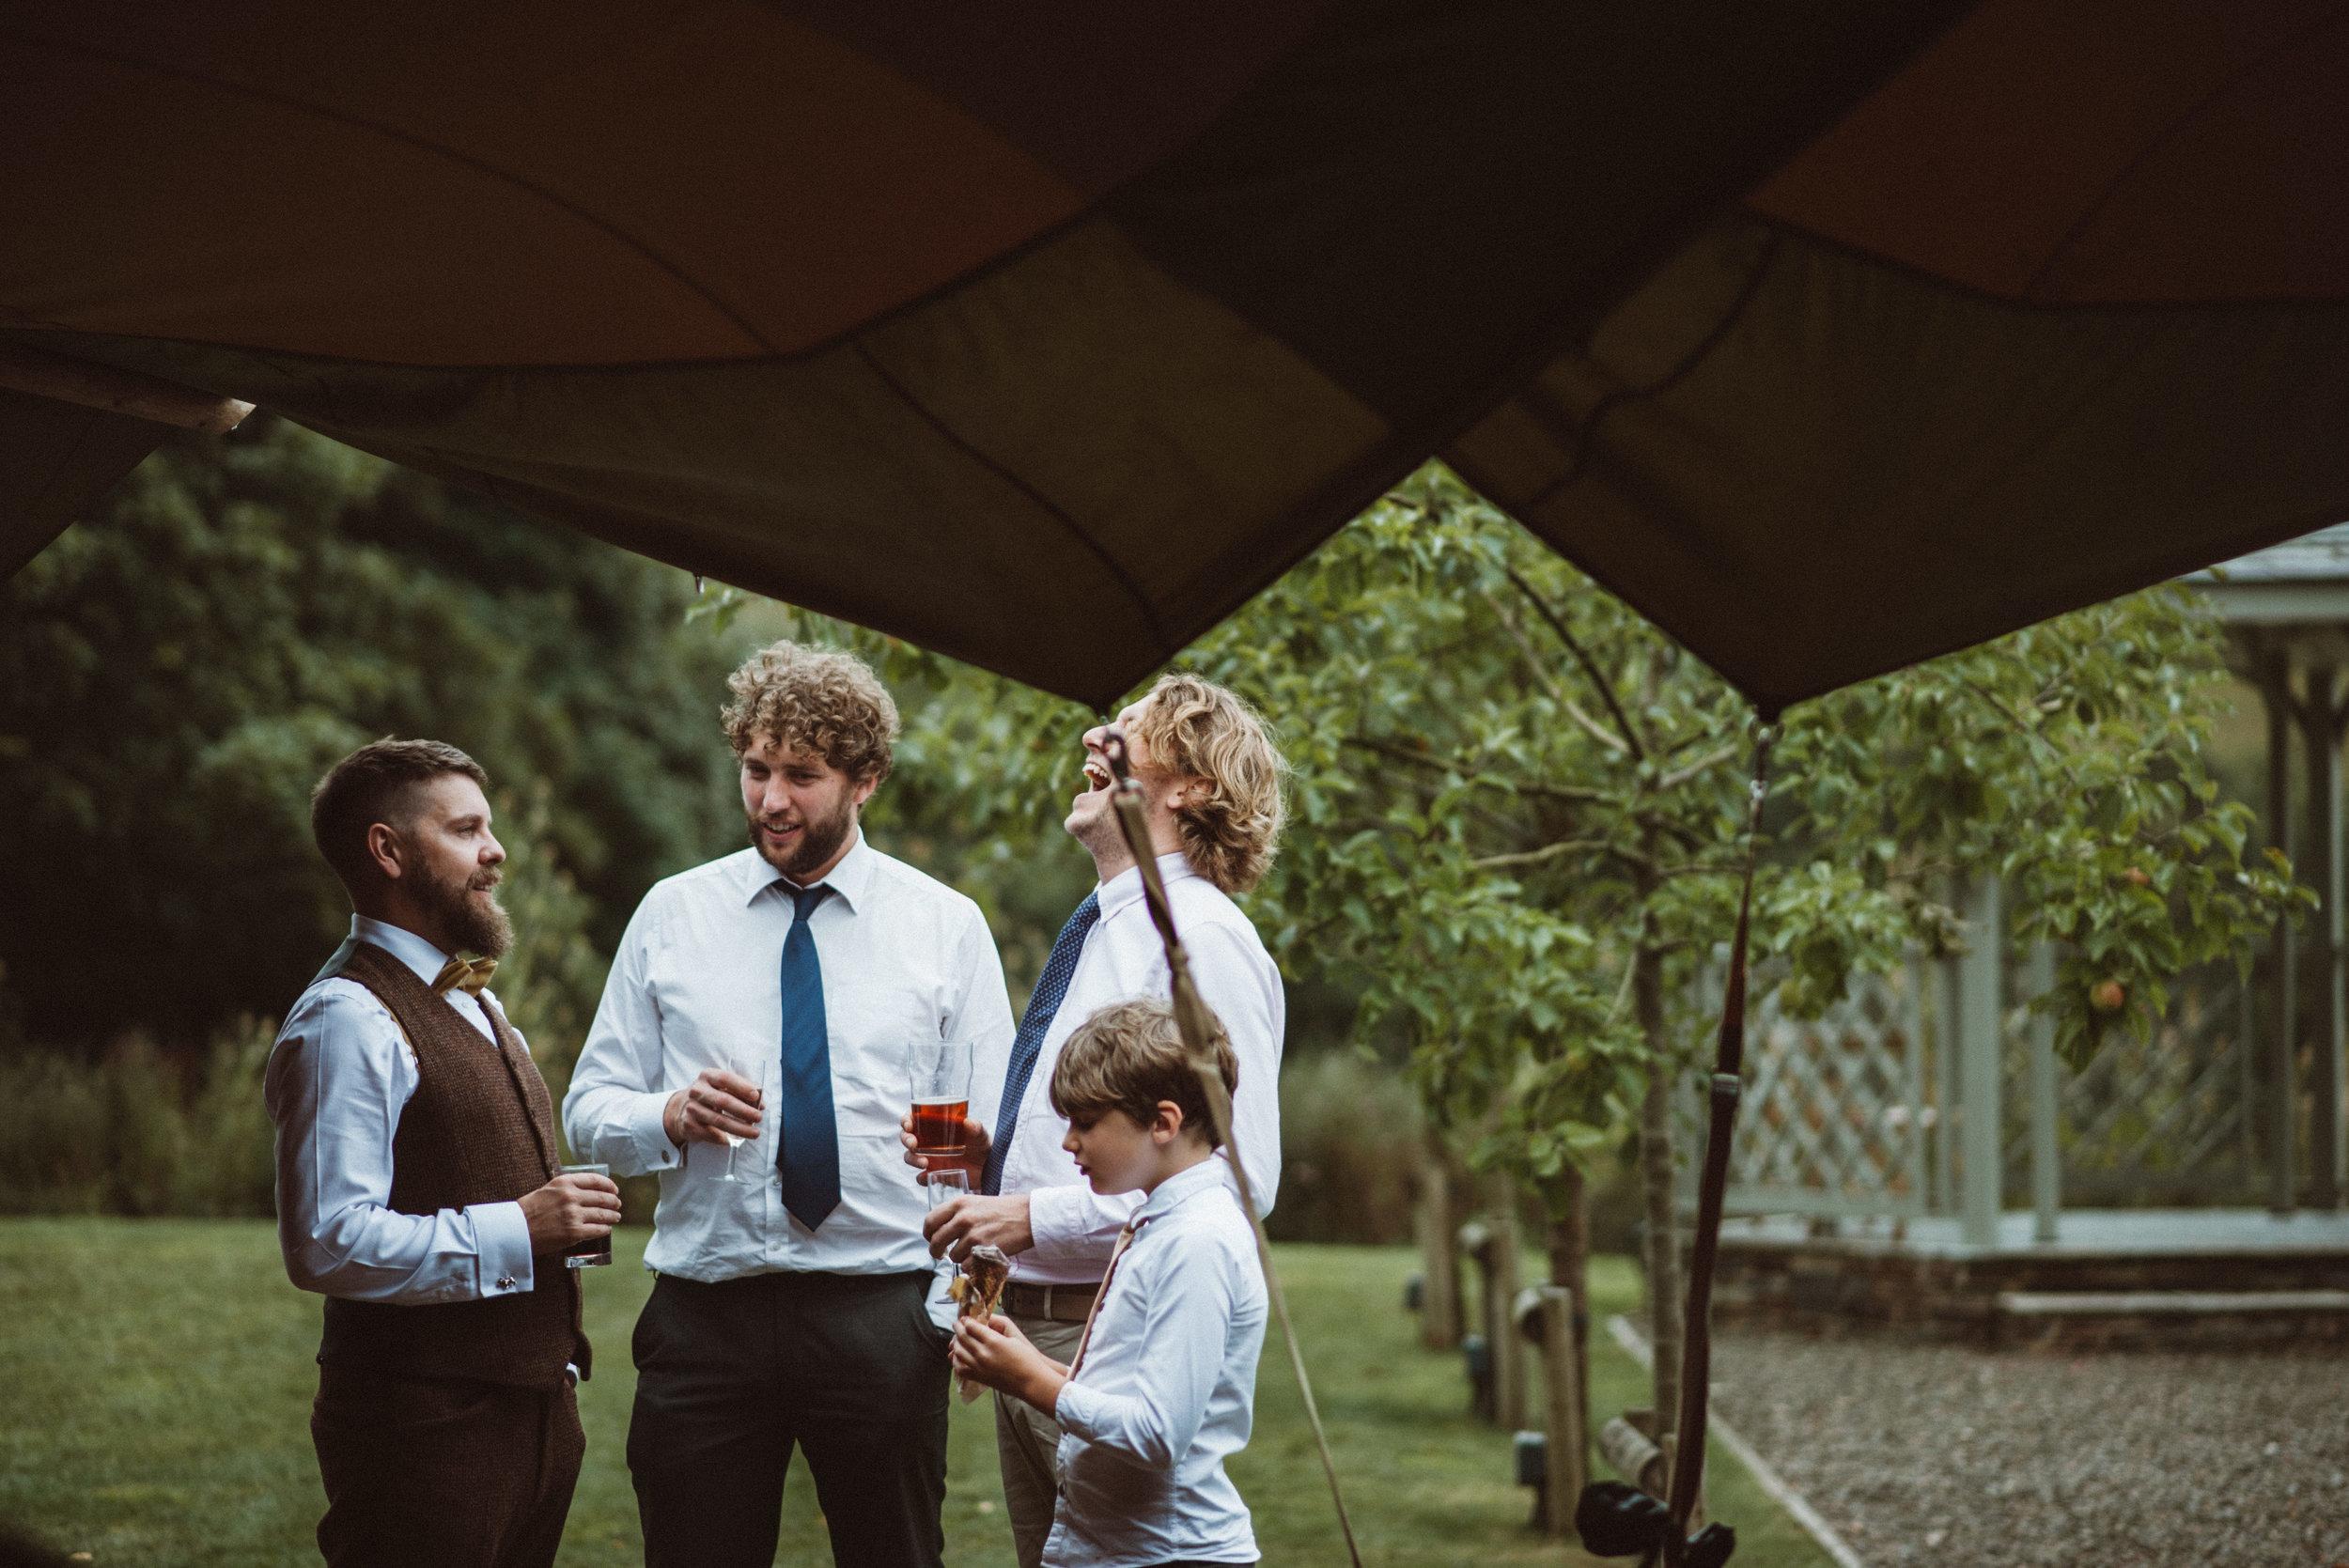 pengenna-manor-wedding-photographer-50.jpg